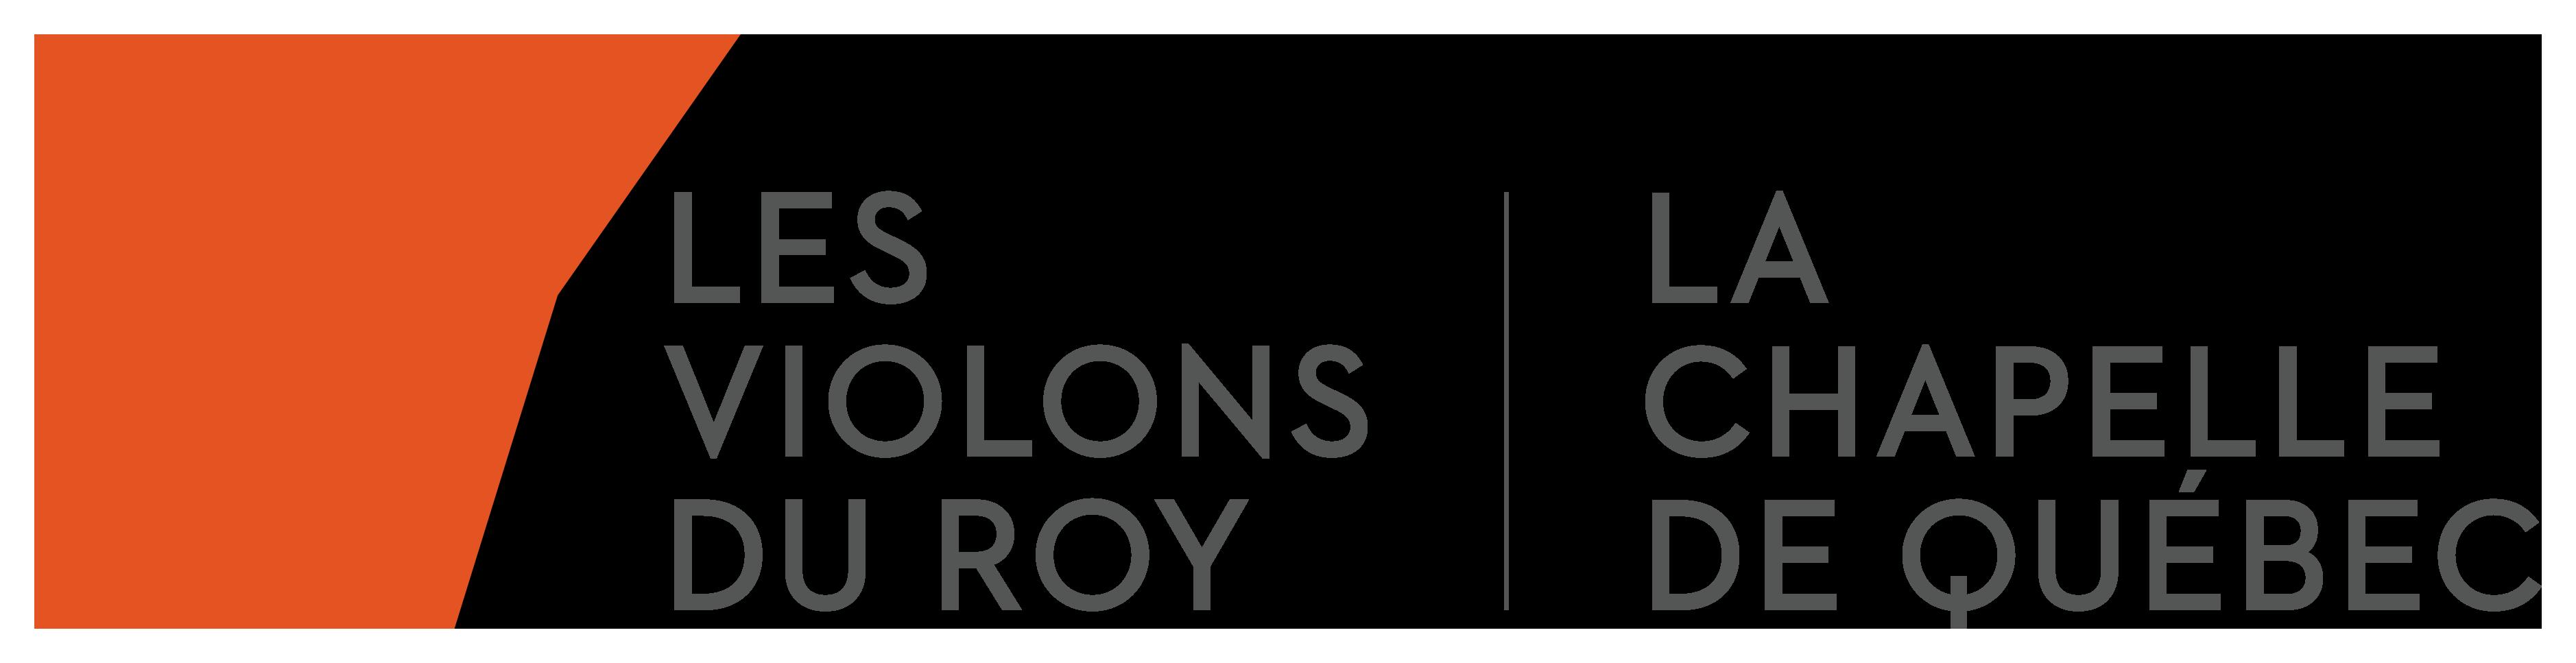 Les Violons du Roy-CHP-RGB